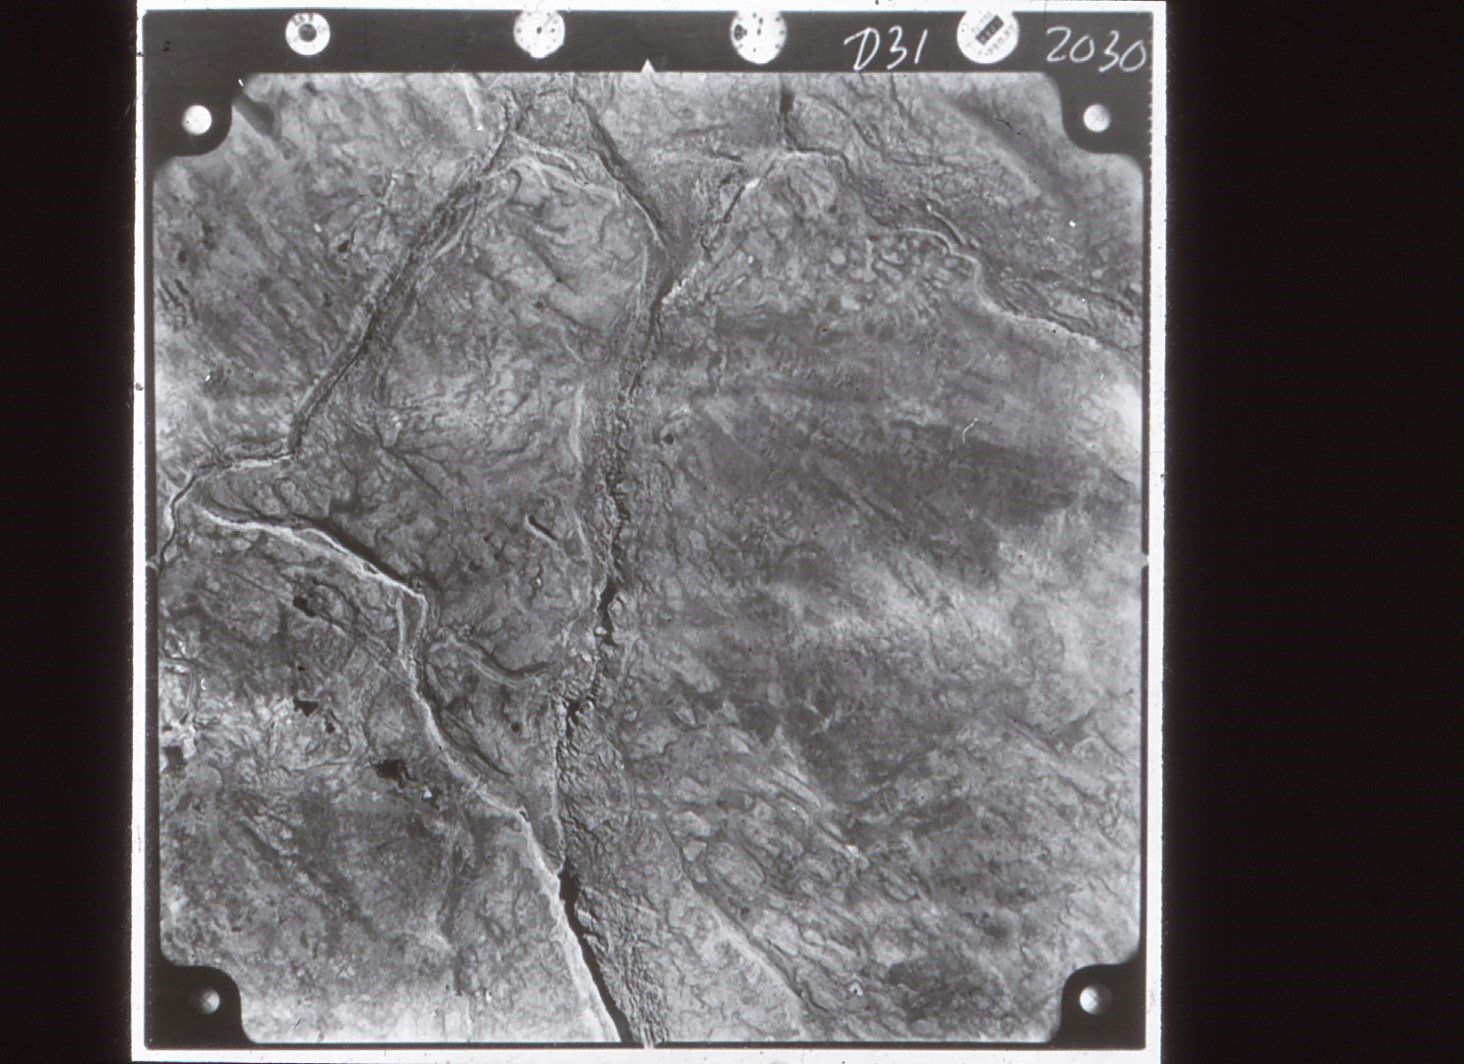 953a Luchtfoto van deze canyon